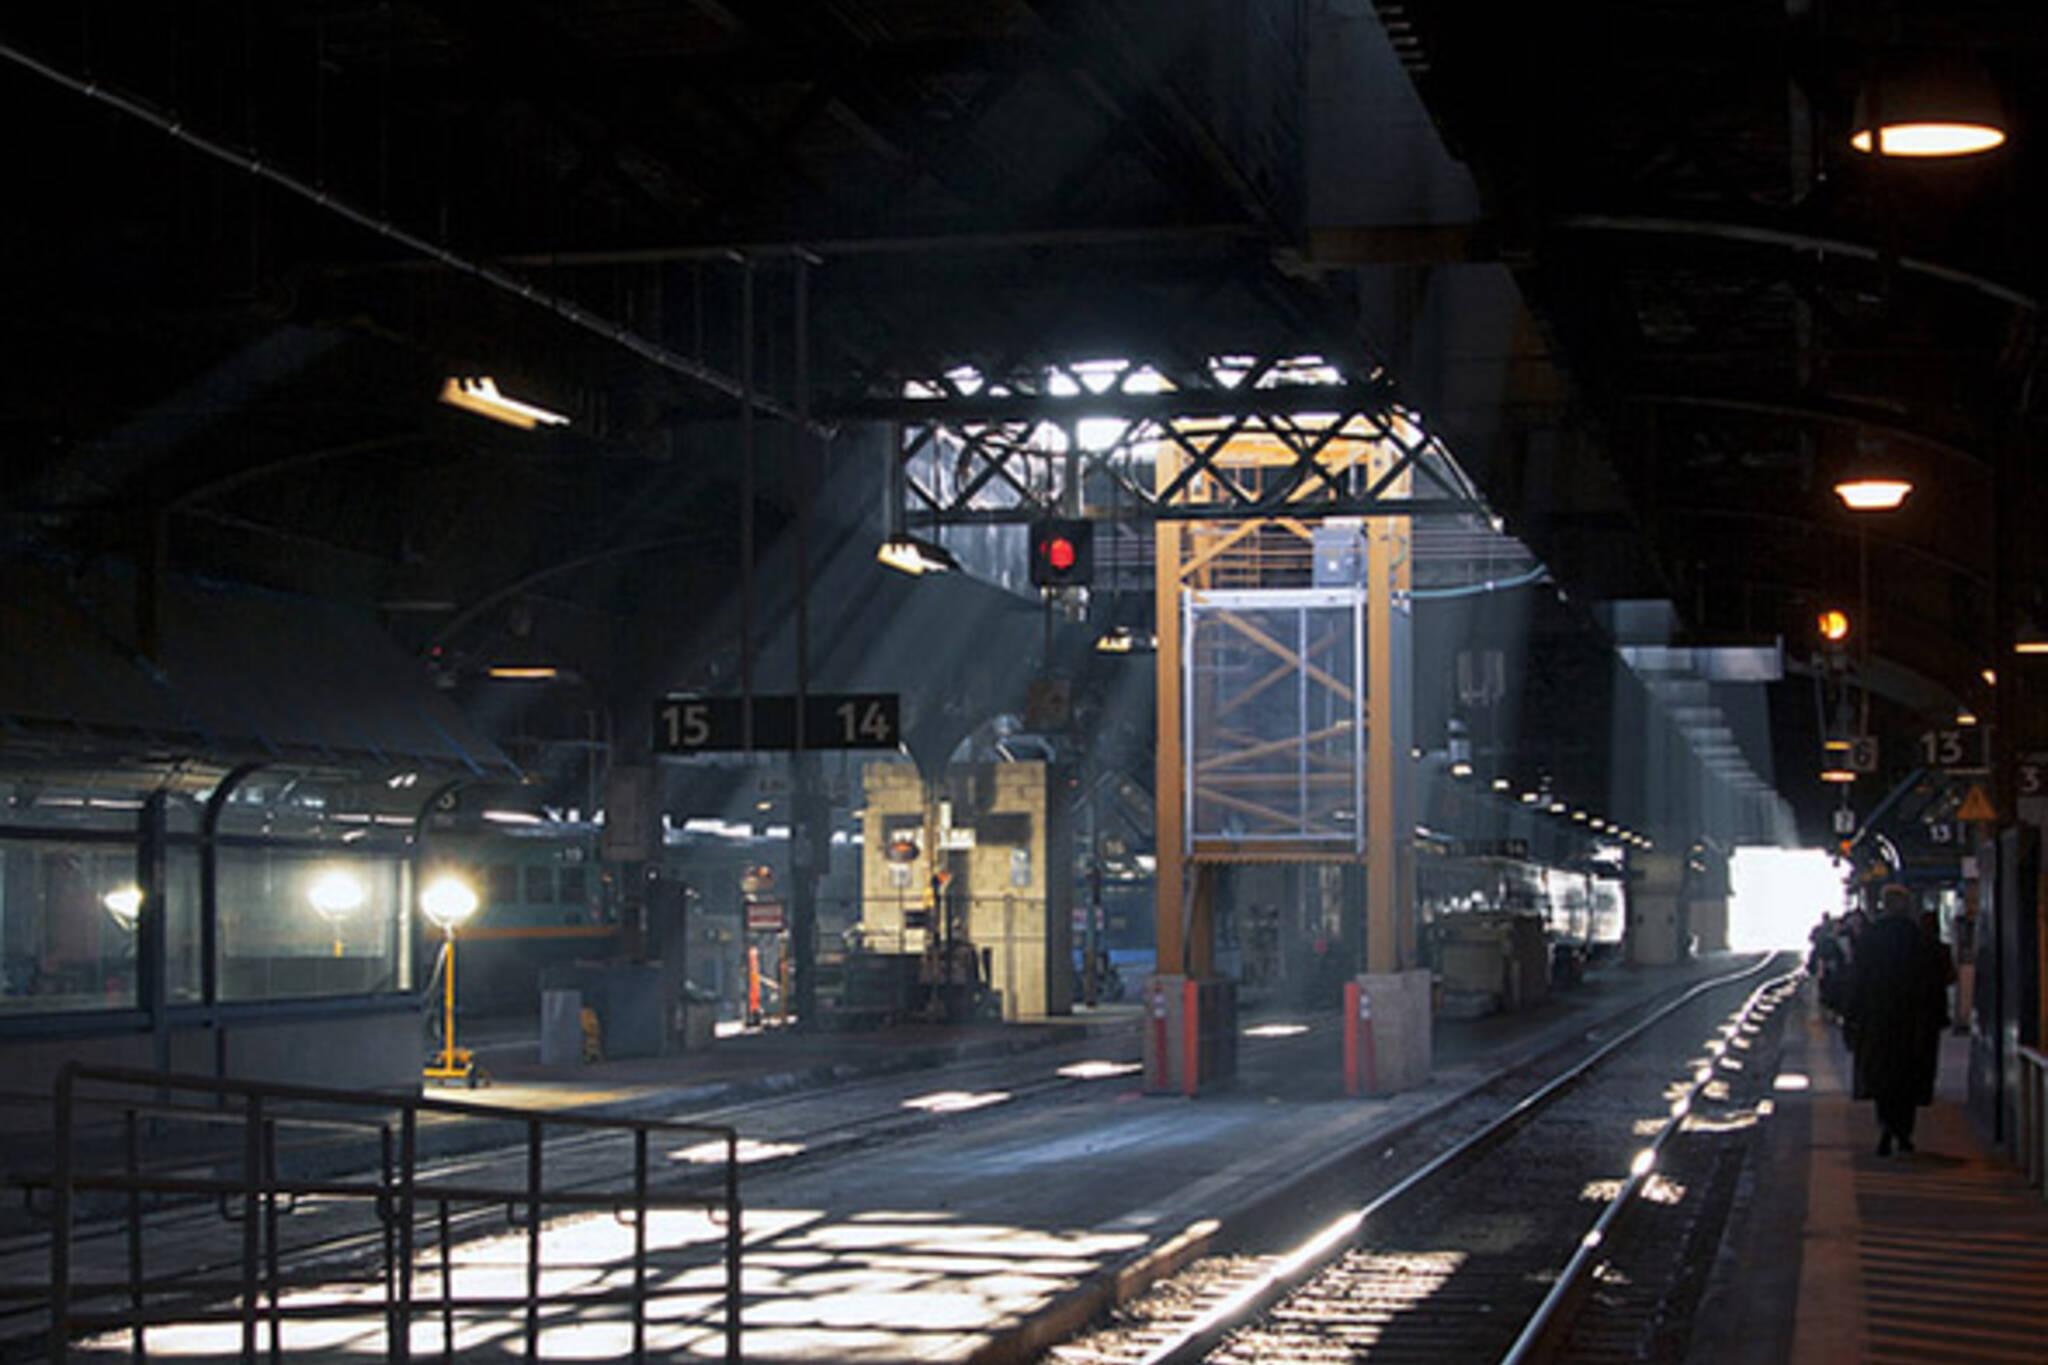 Union staion platform